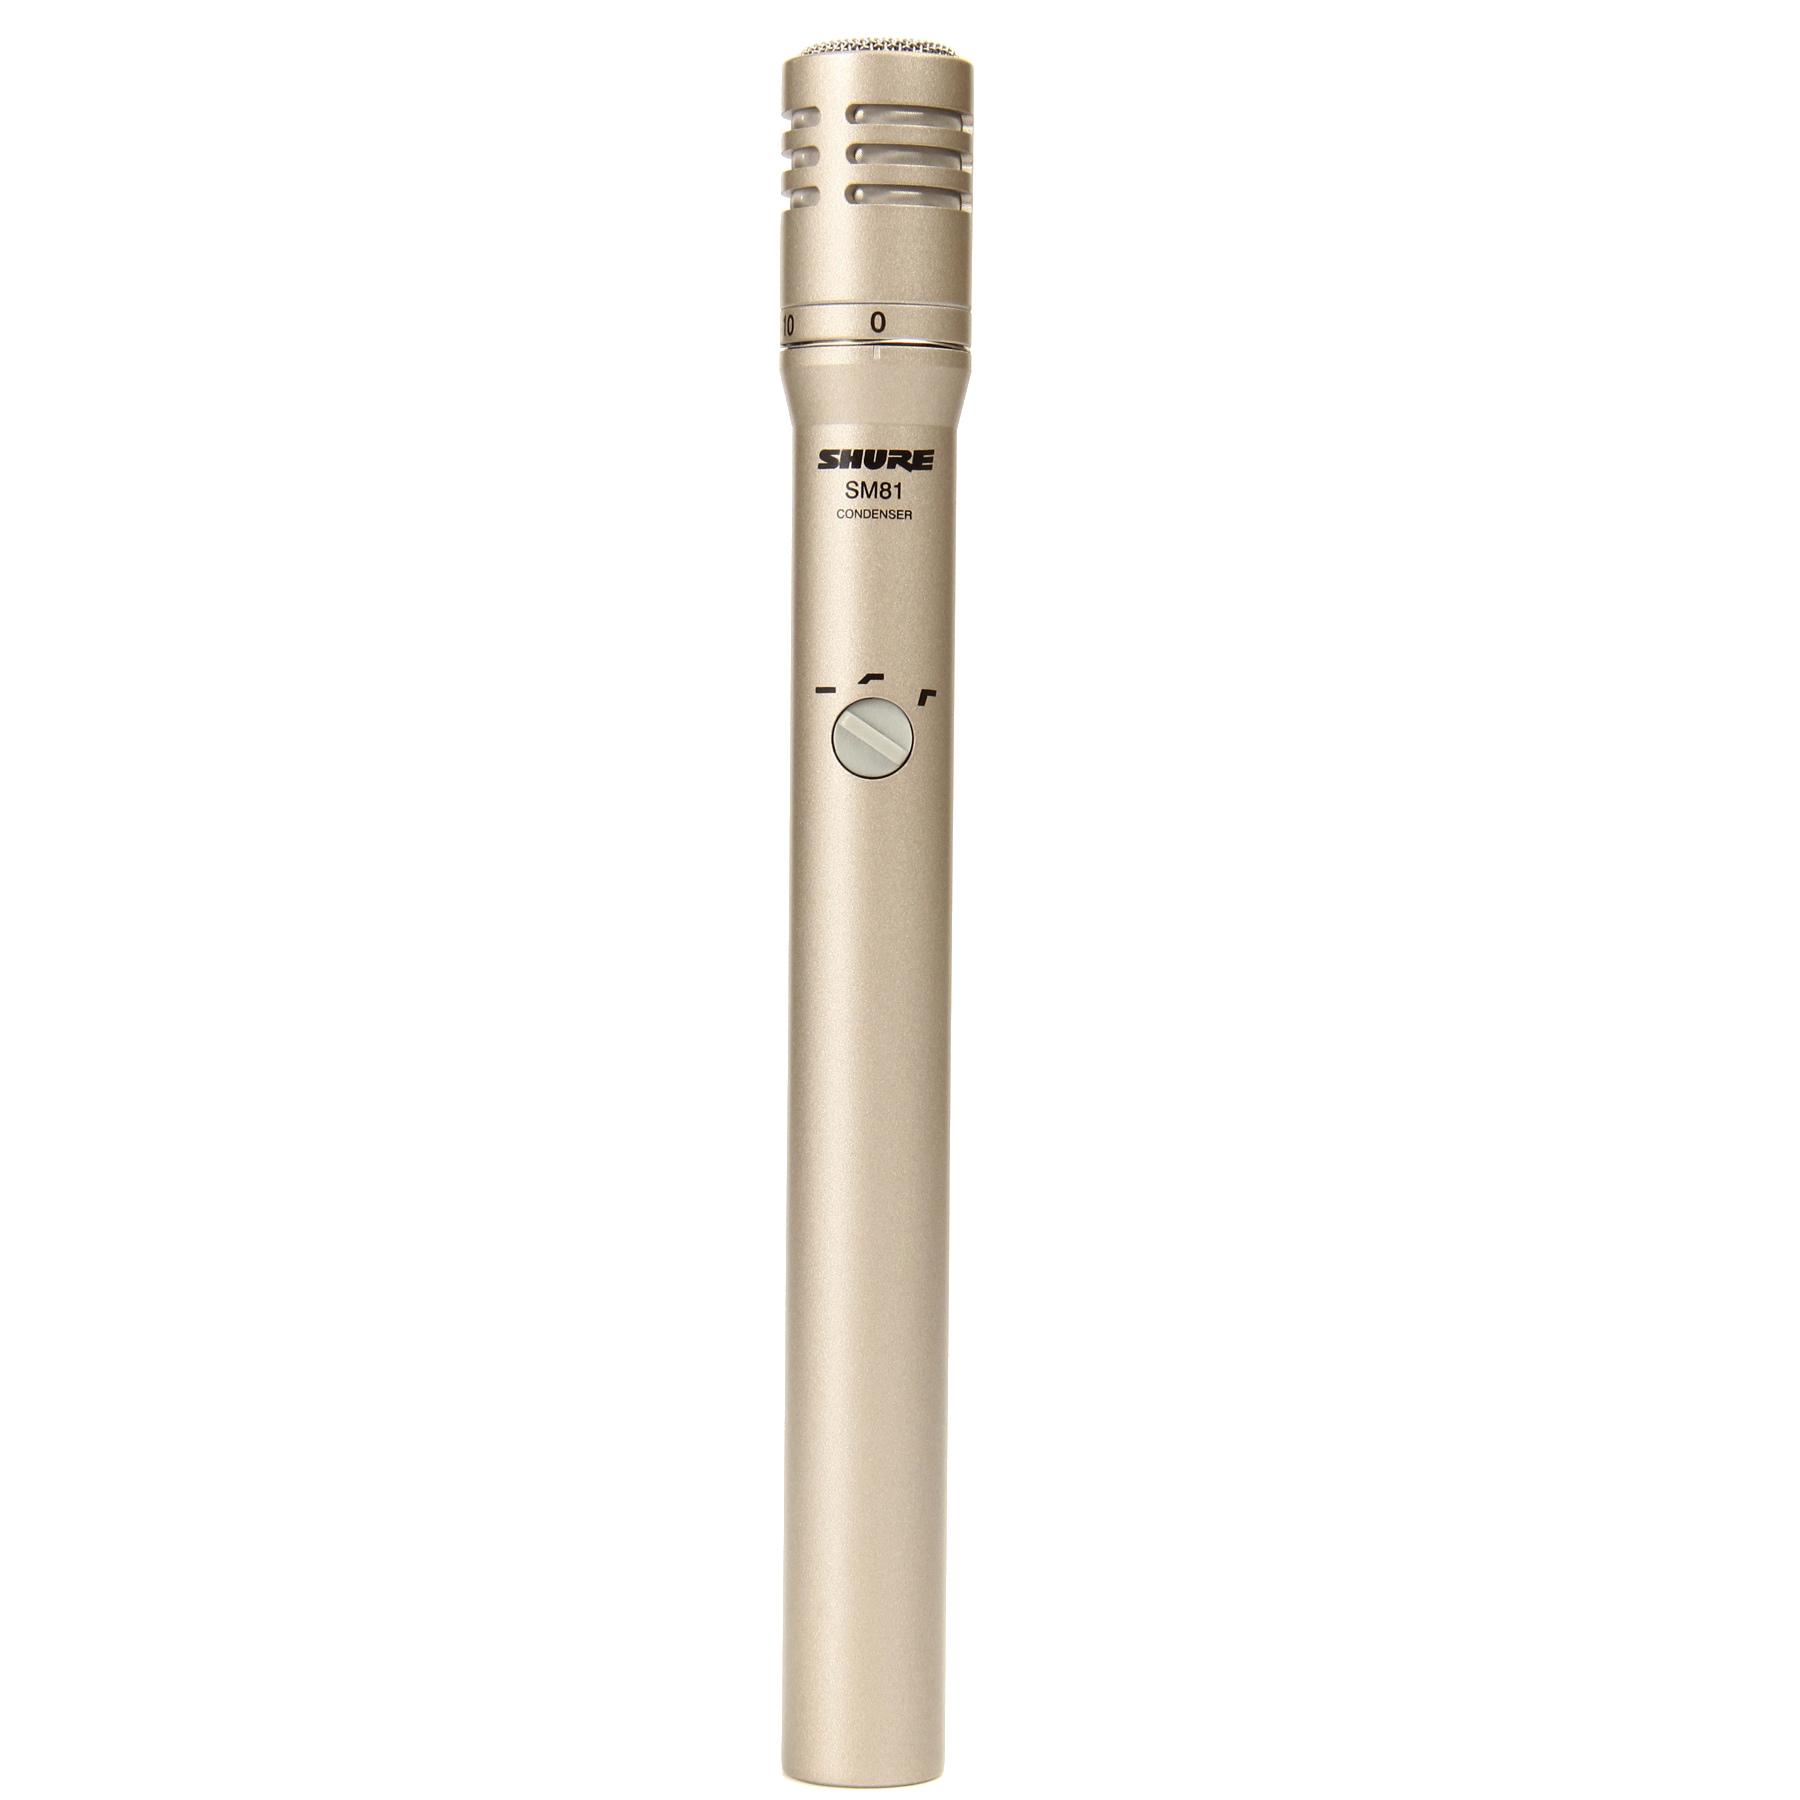 Shure SM81 Condenser Microphone